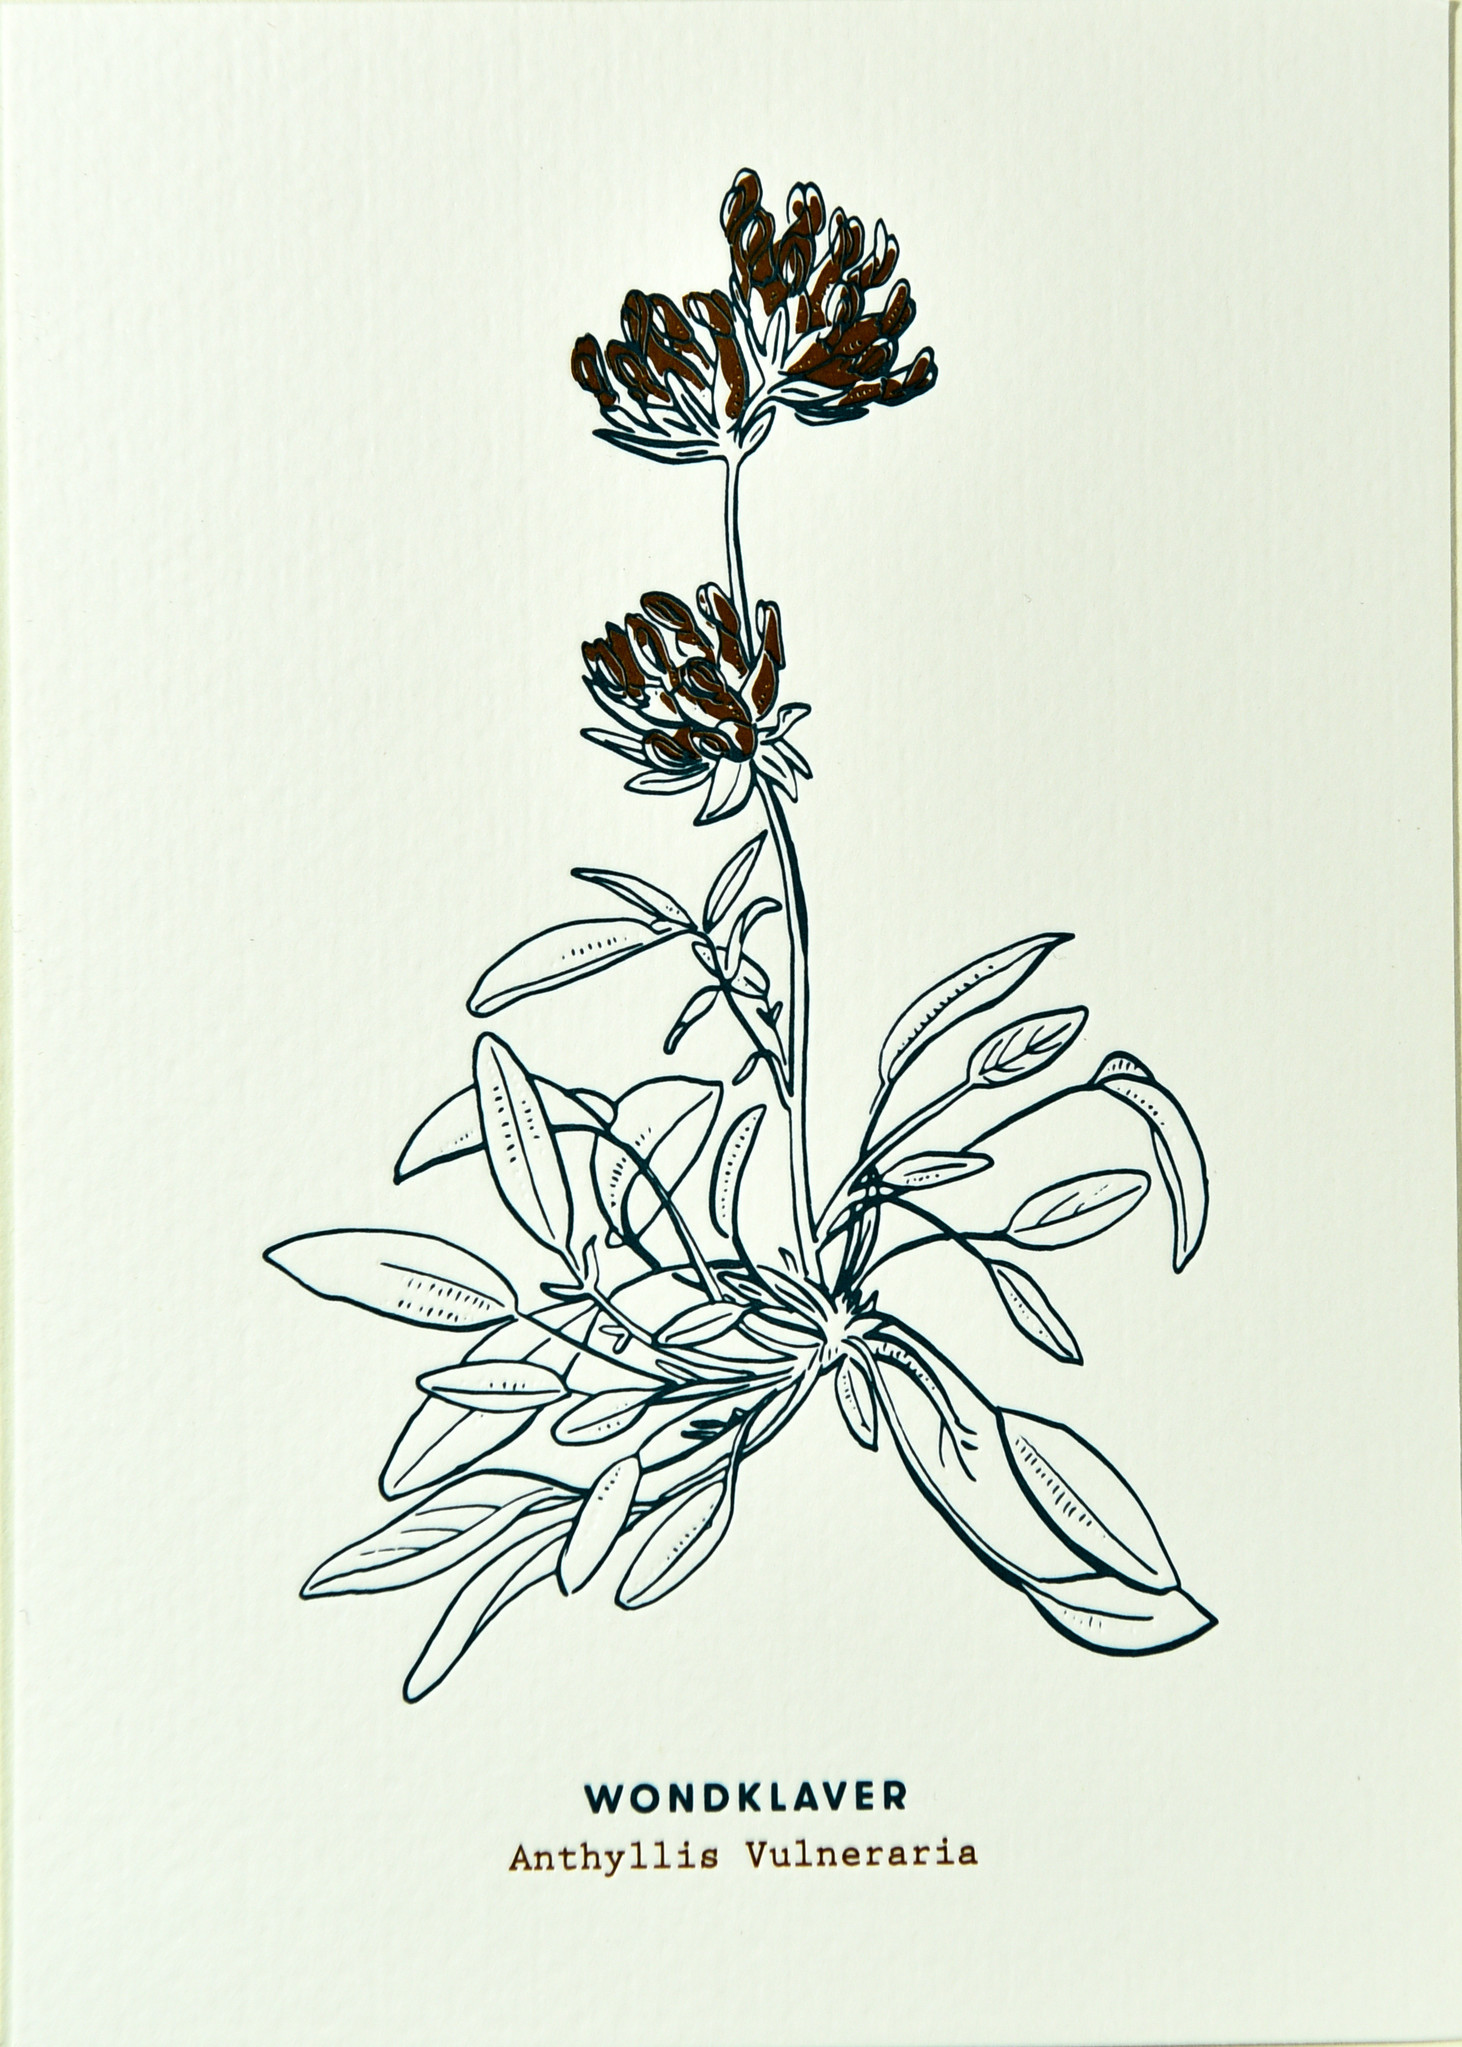 Blommm Luxury postcard Clover - Blommm